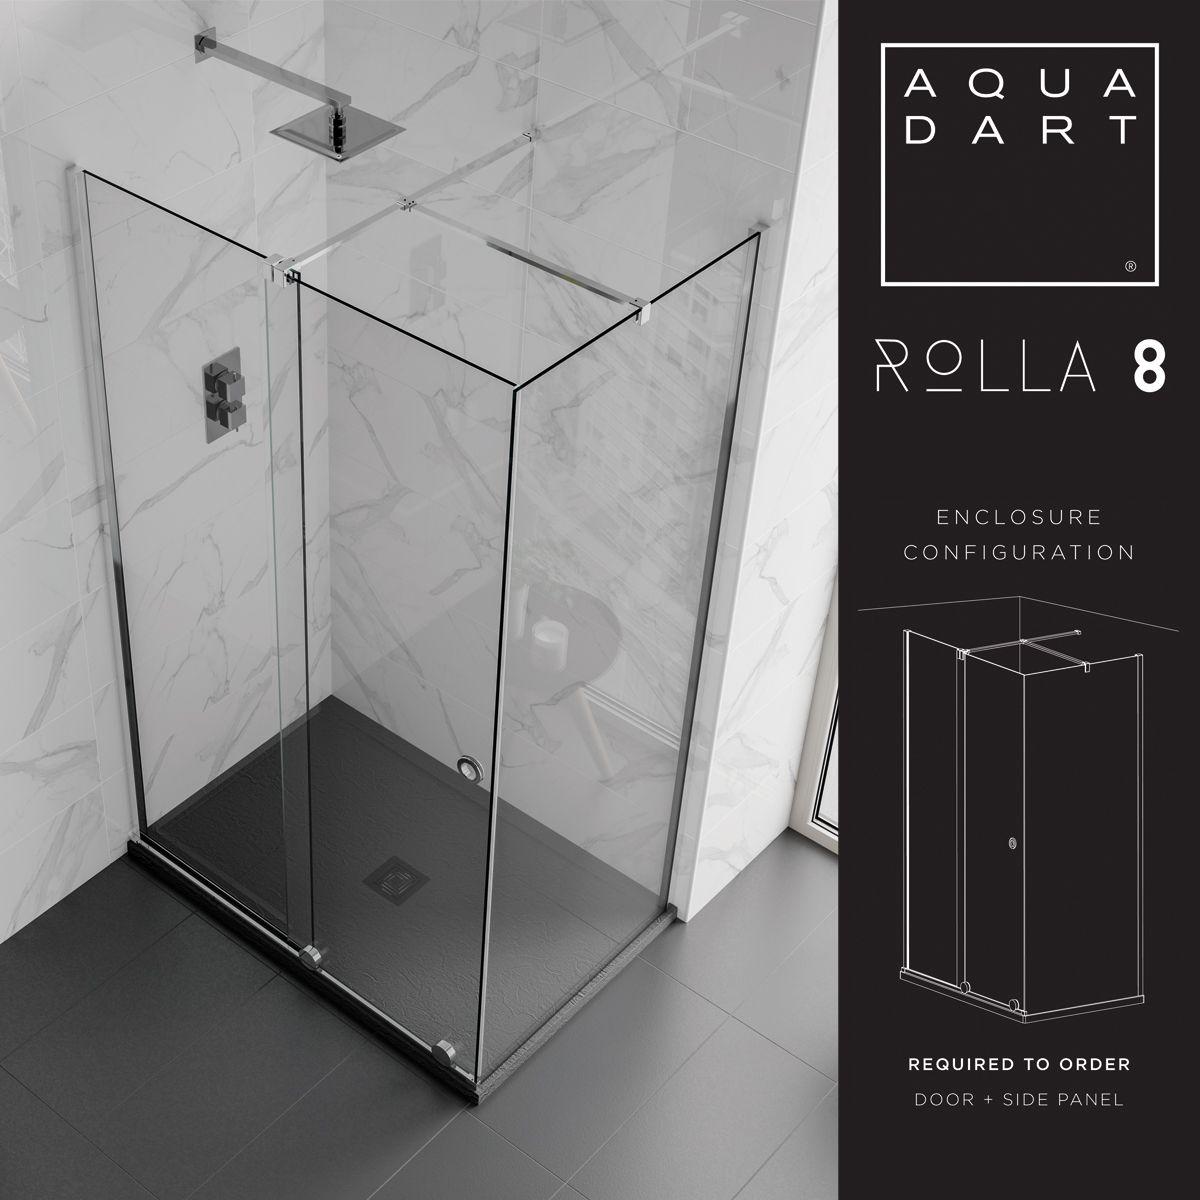 Aquadart Rolla 8 Black Sliding Shower Door with Side Panel Configuration